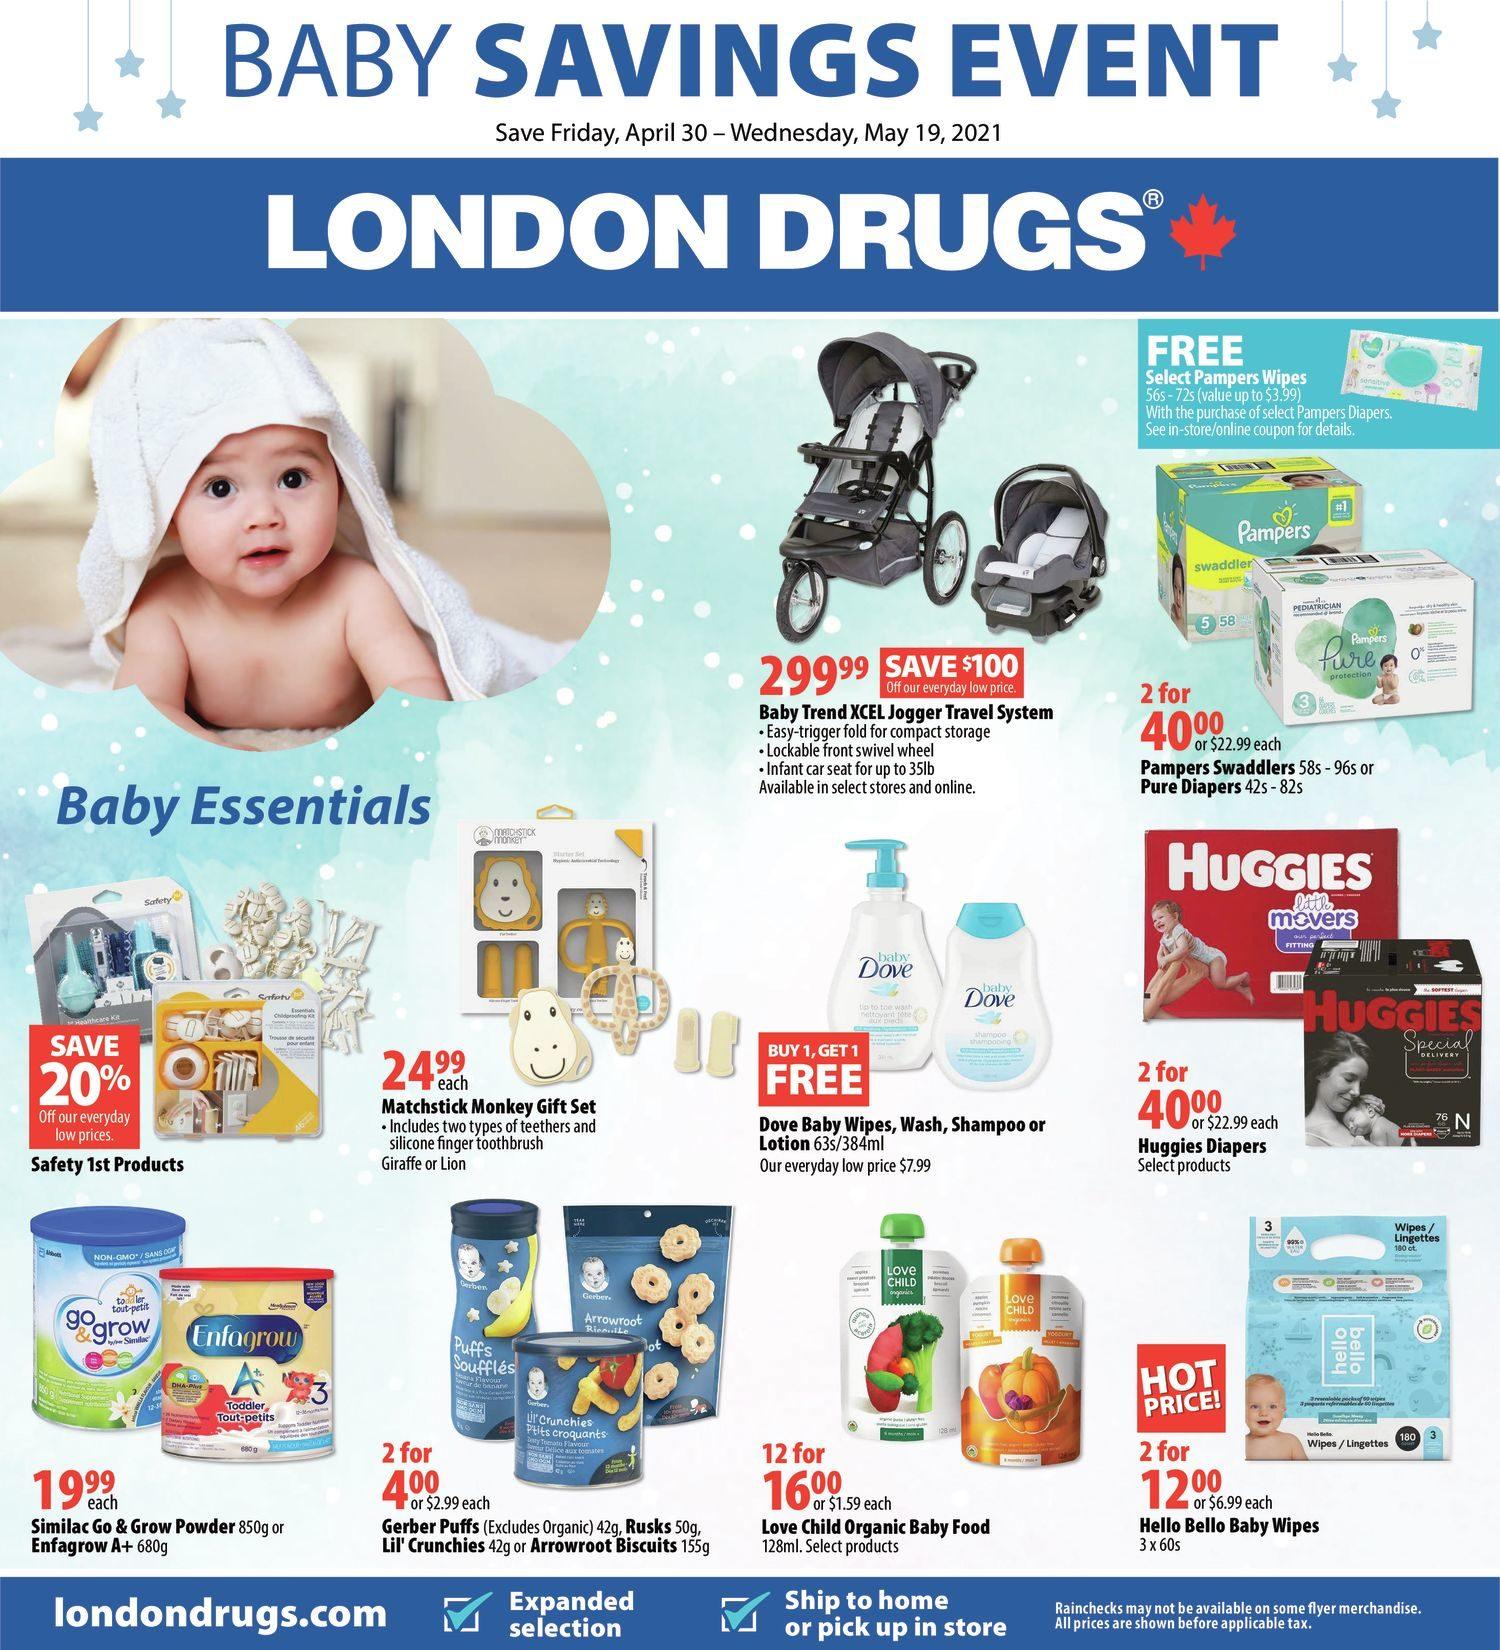 London Drugs - Baby Savings Event